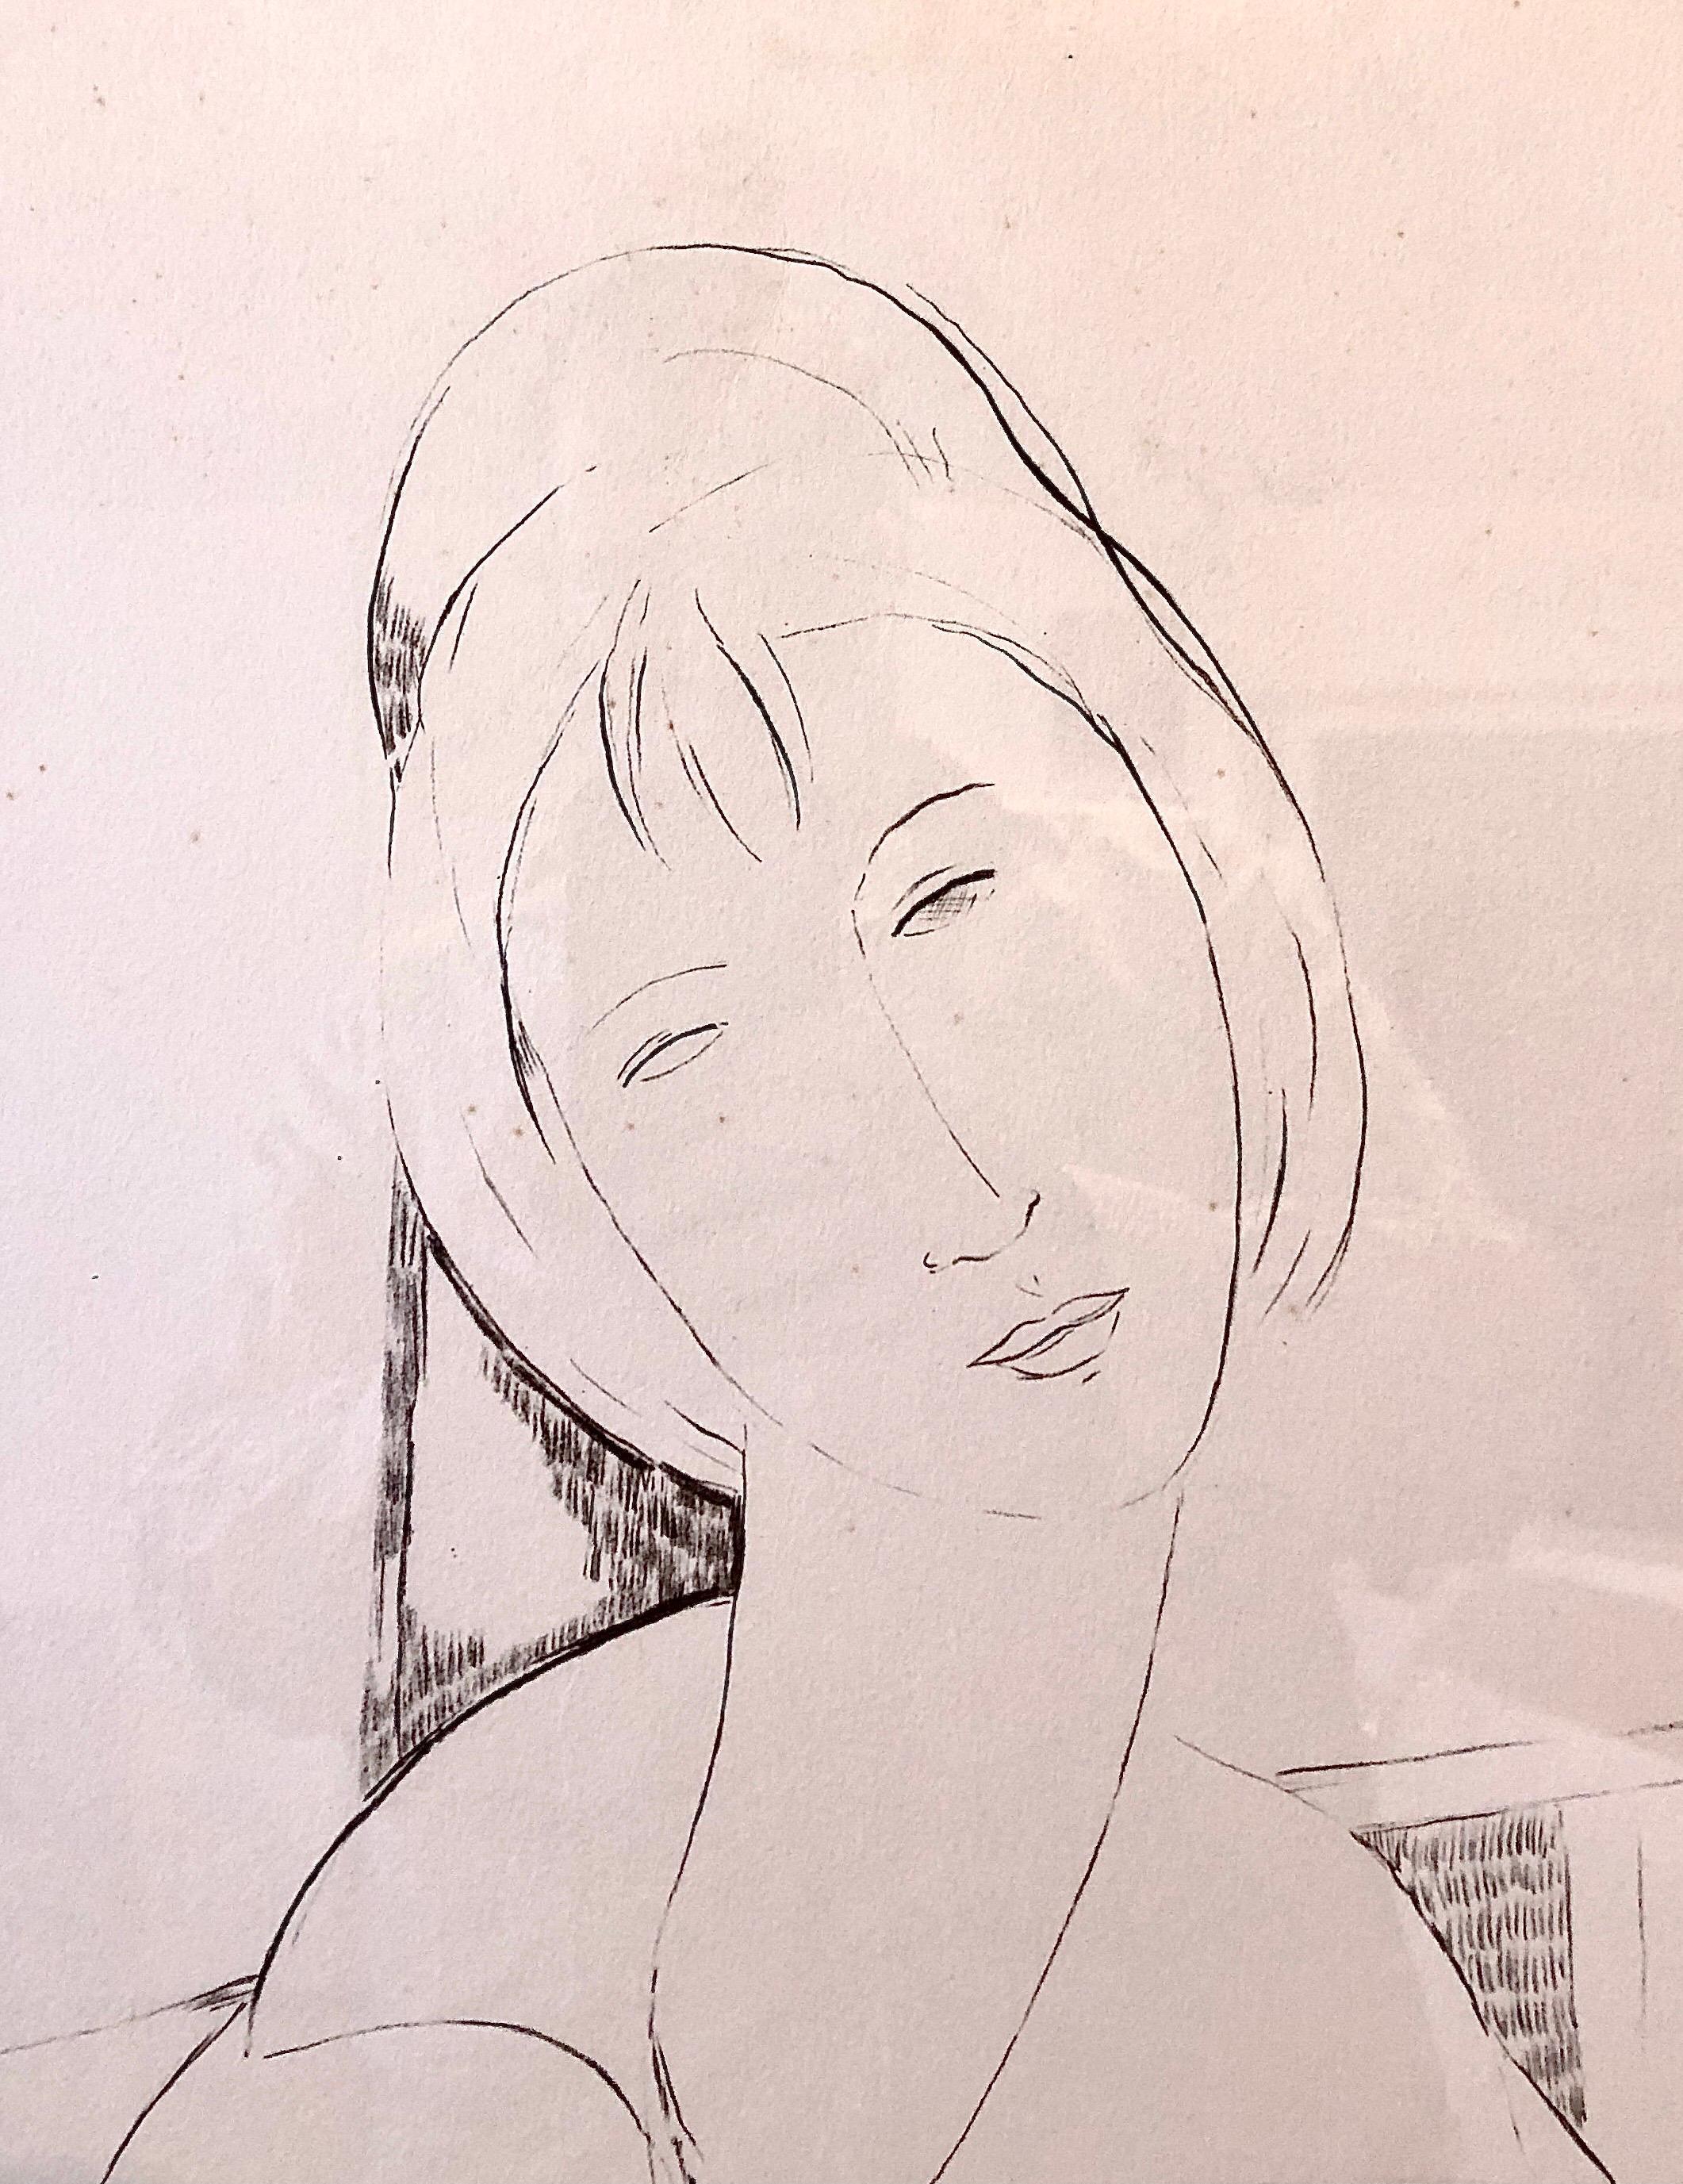 Elmyr De Hory Lithograph after Modigliani Art Deco Head of Woman Hand Signed